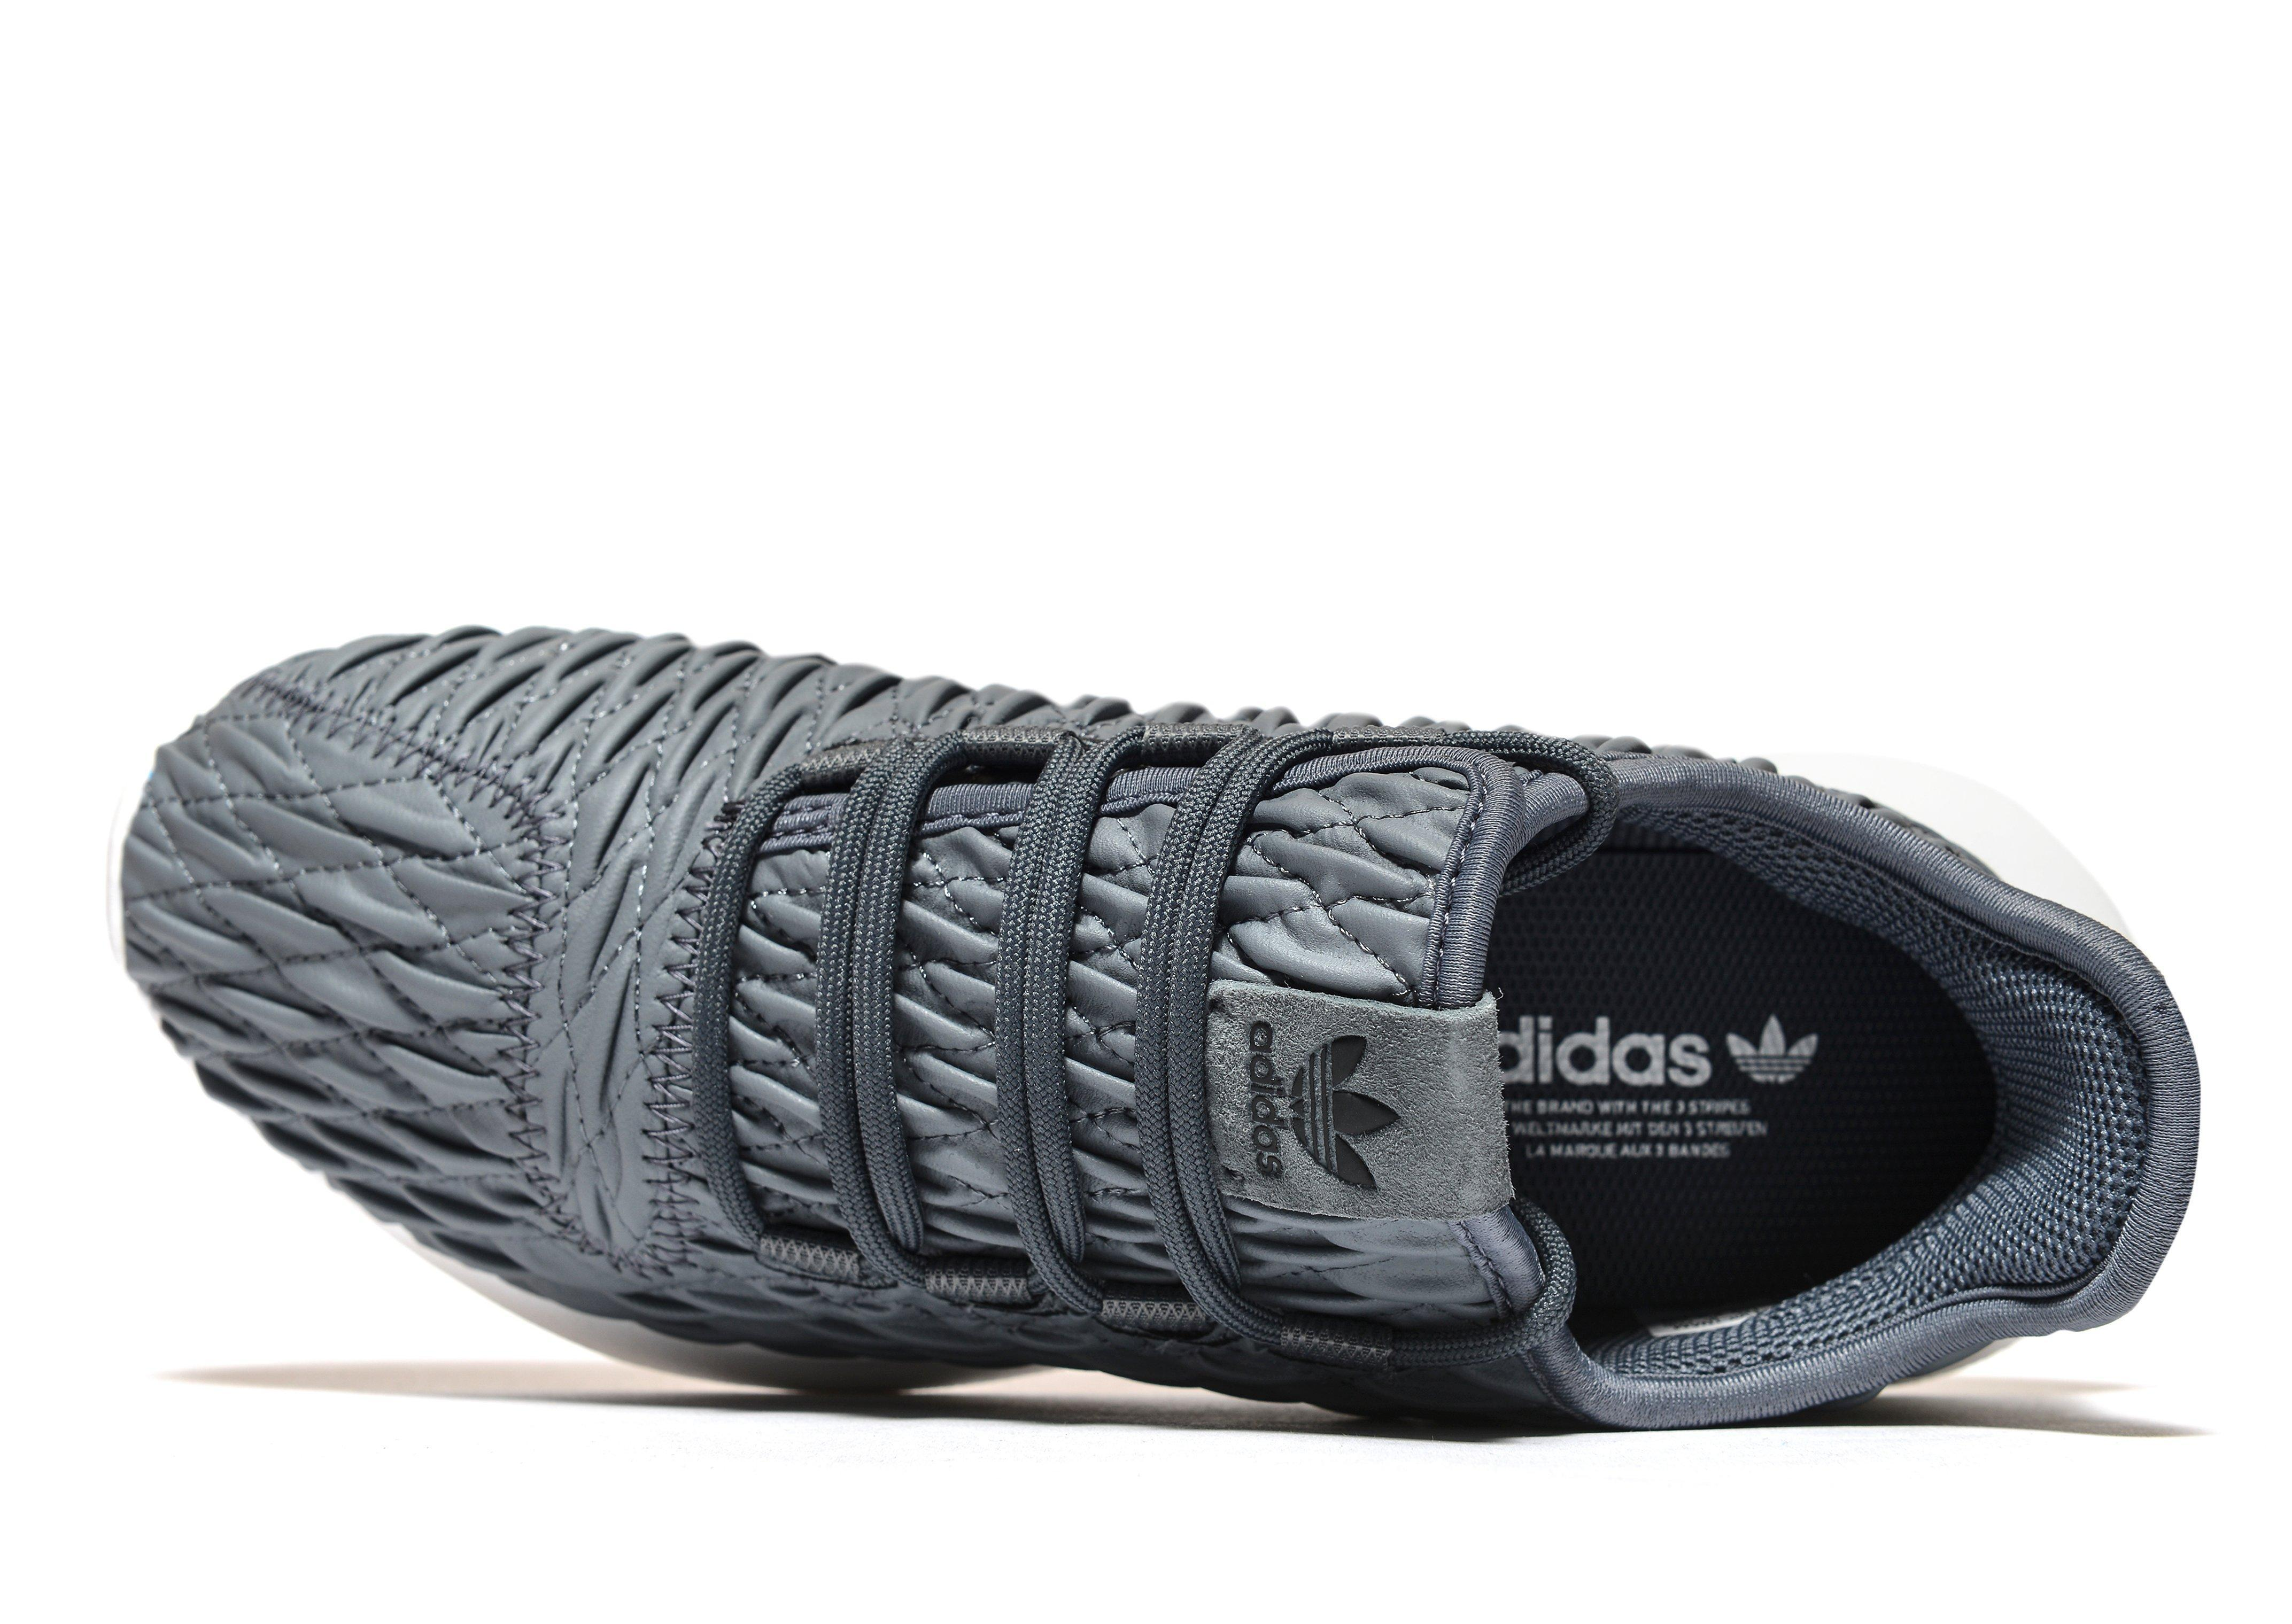 Lyst adidas Originals tubular sombra lux en gris